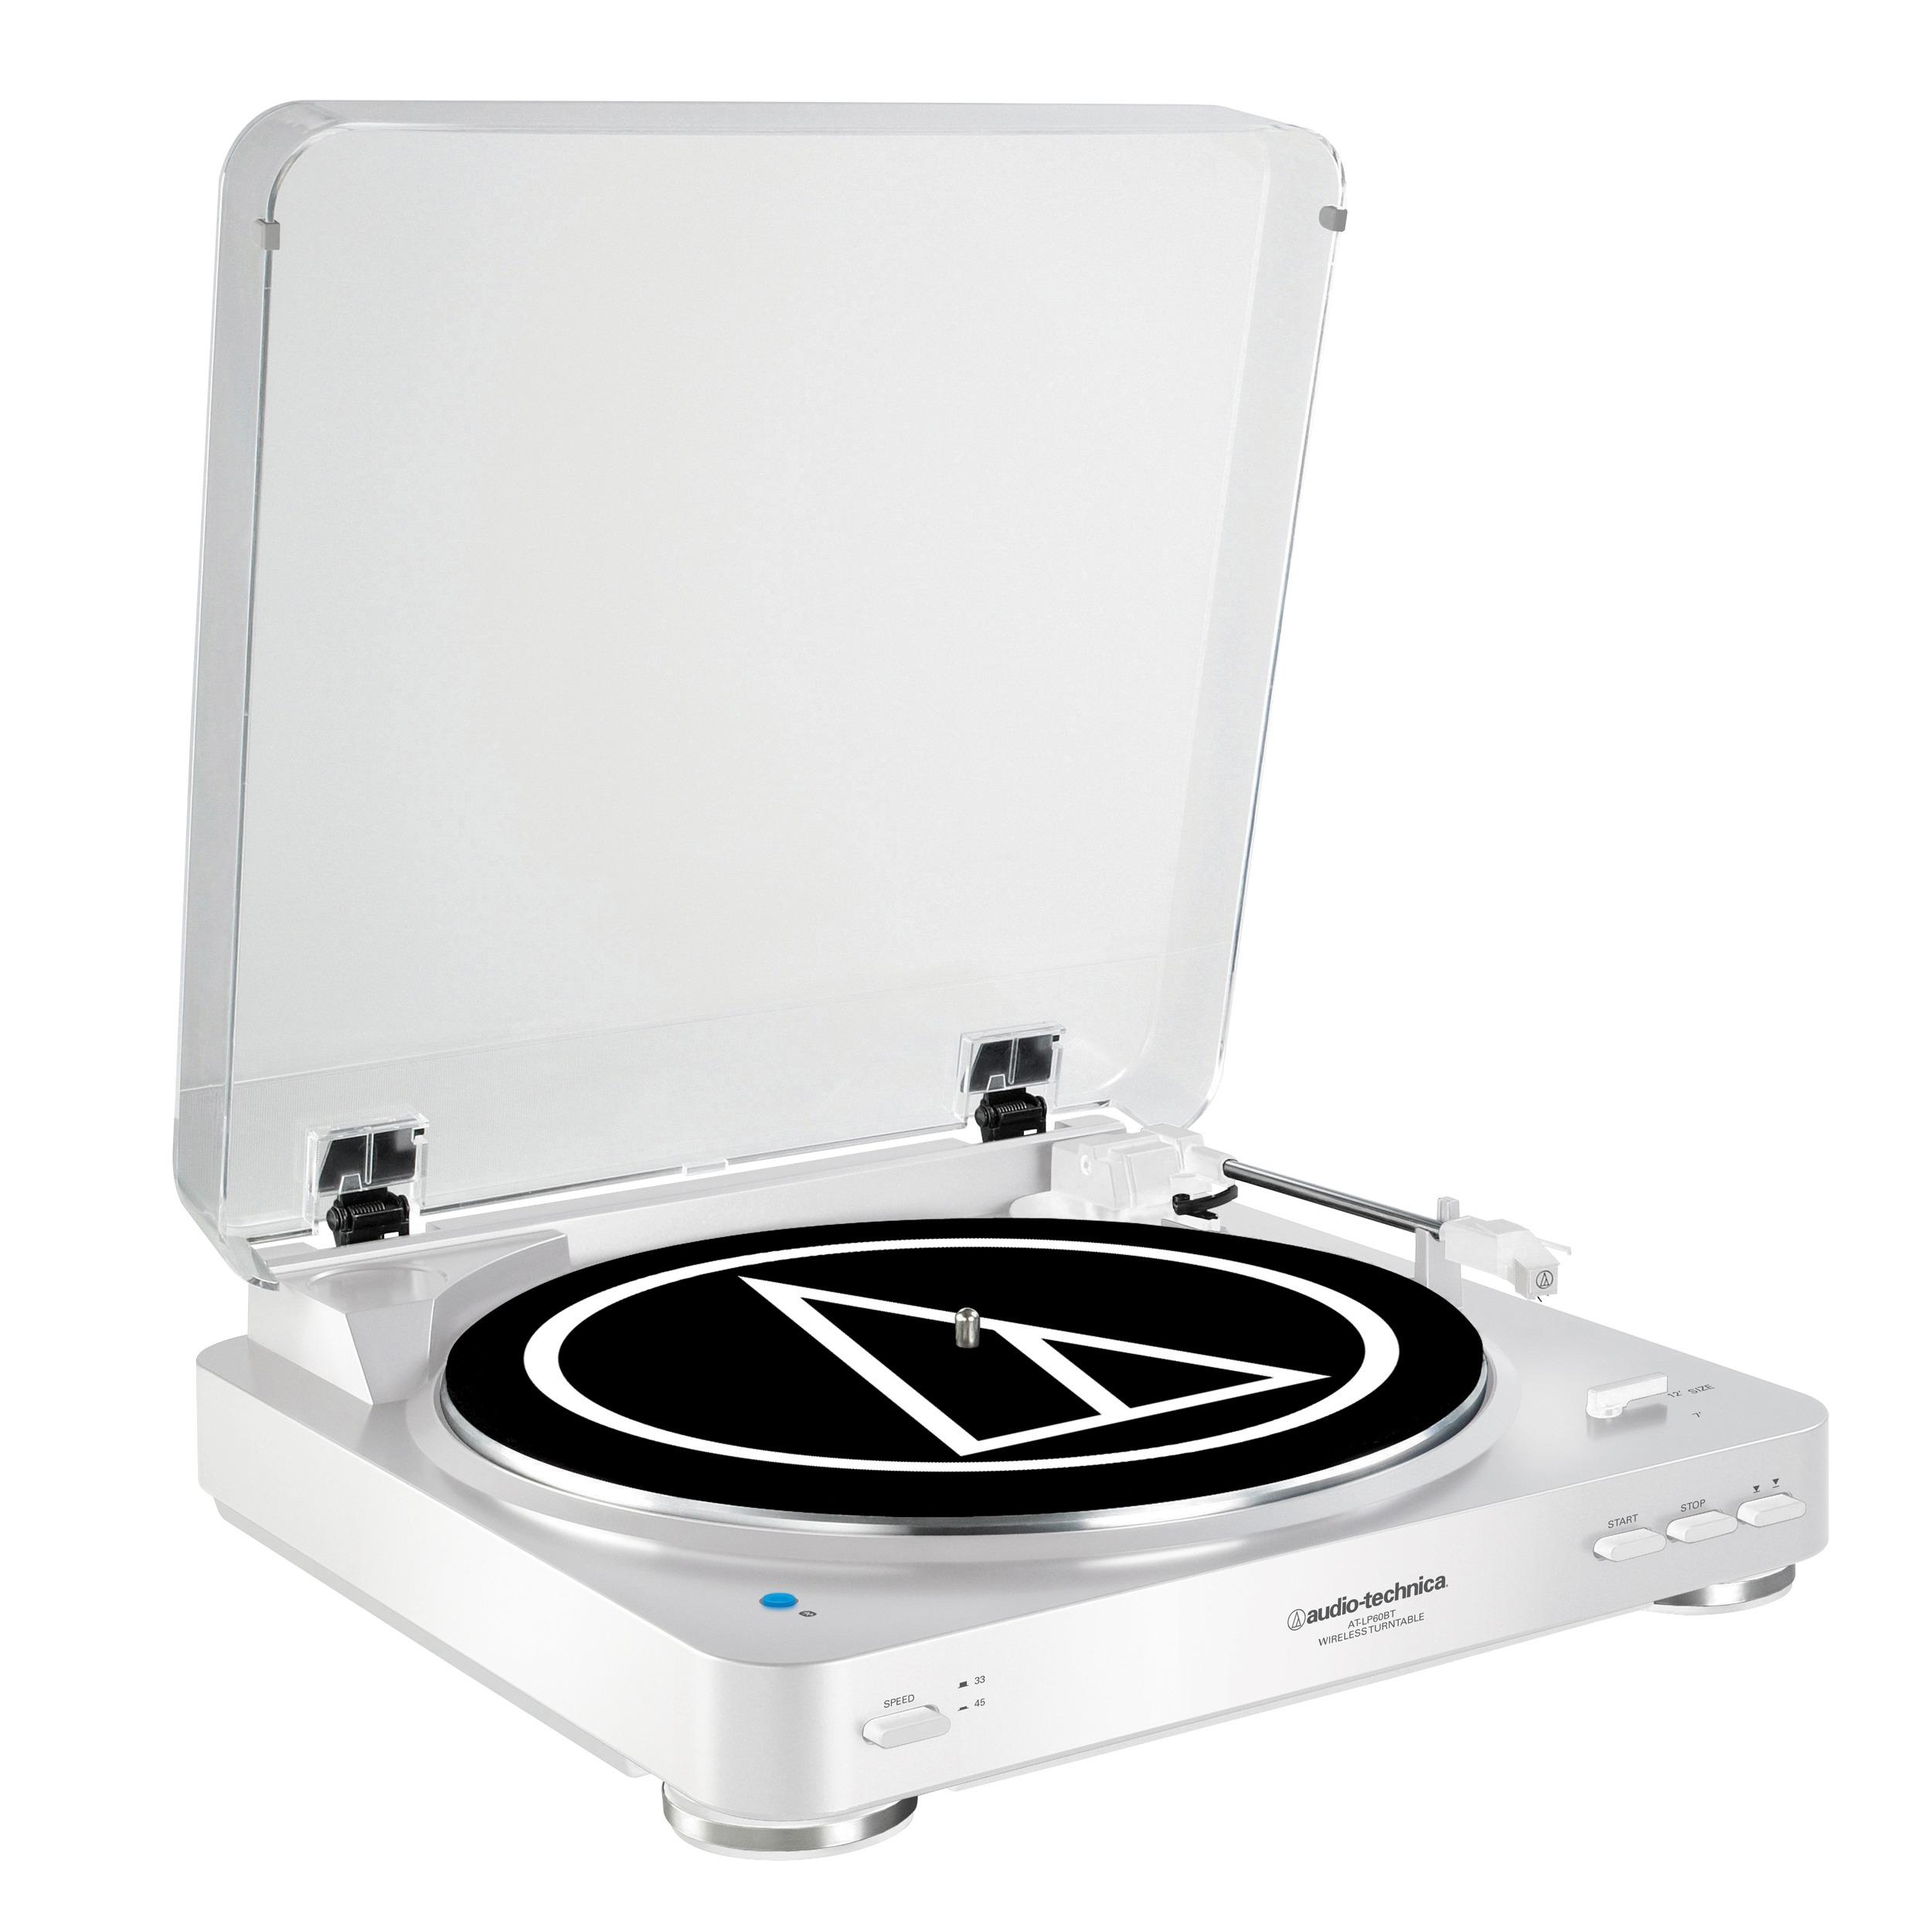 AT-LP60 BT - Turntable   Audio Technica